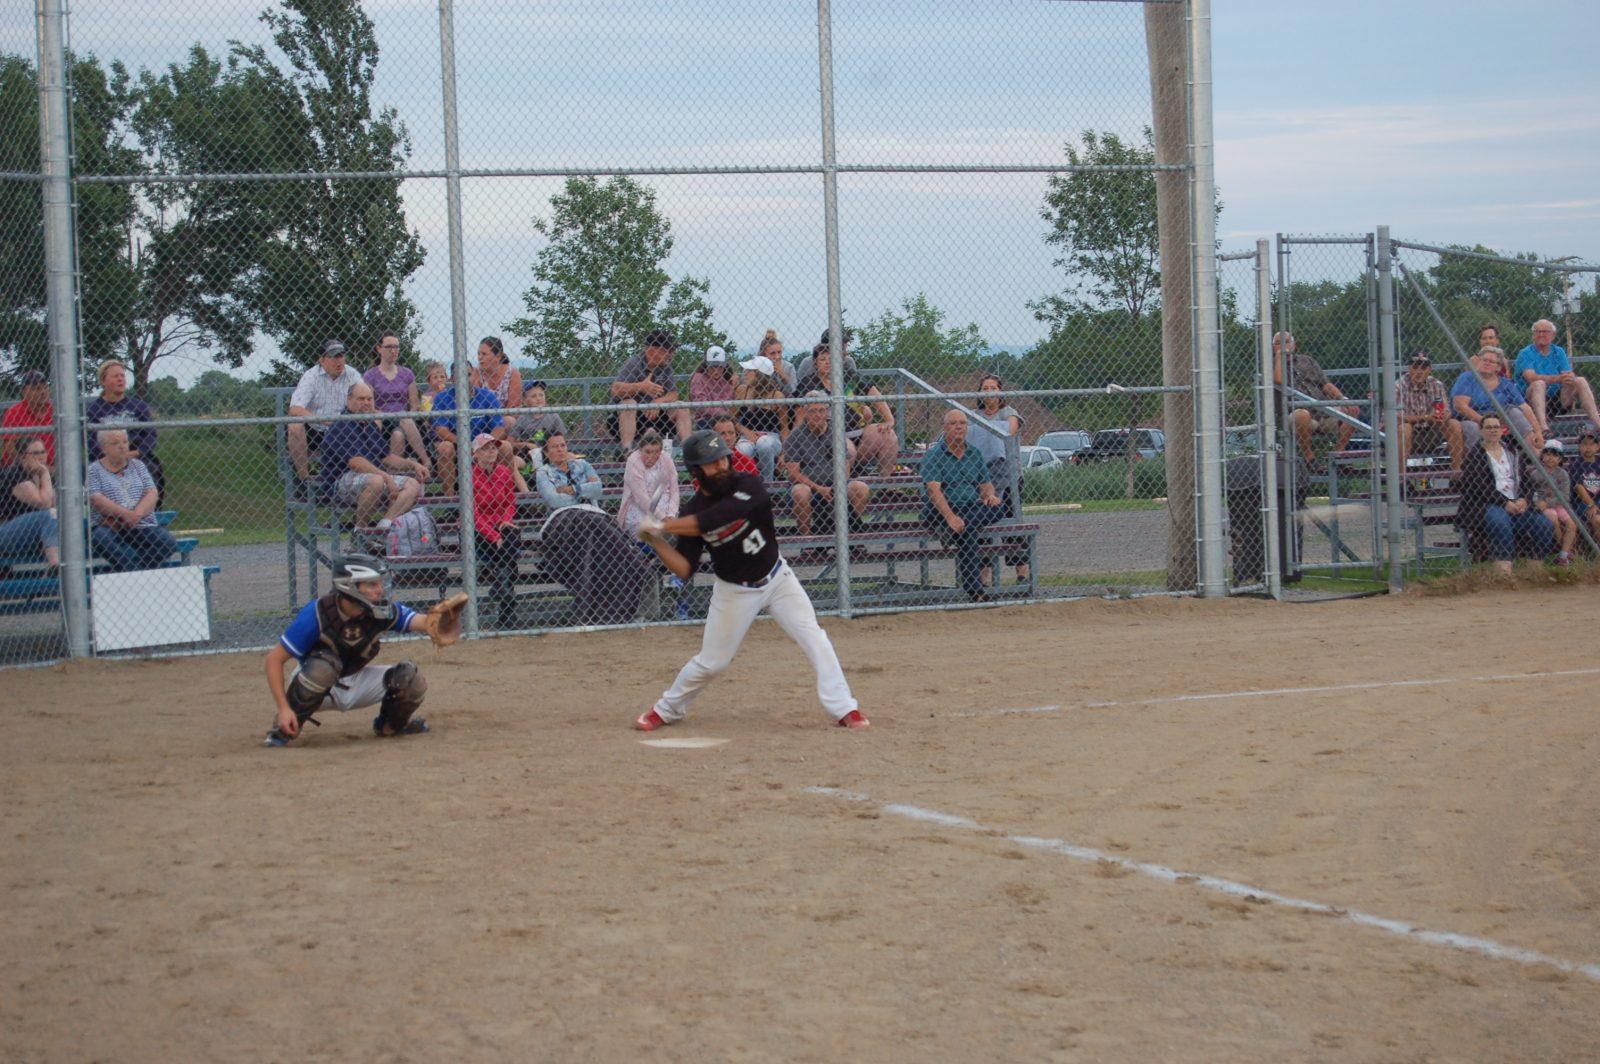 Baseball senior: Montmagny joue 3 matchs en fin de semaine